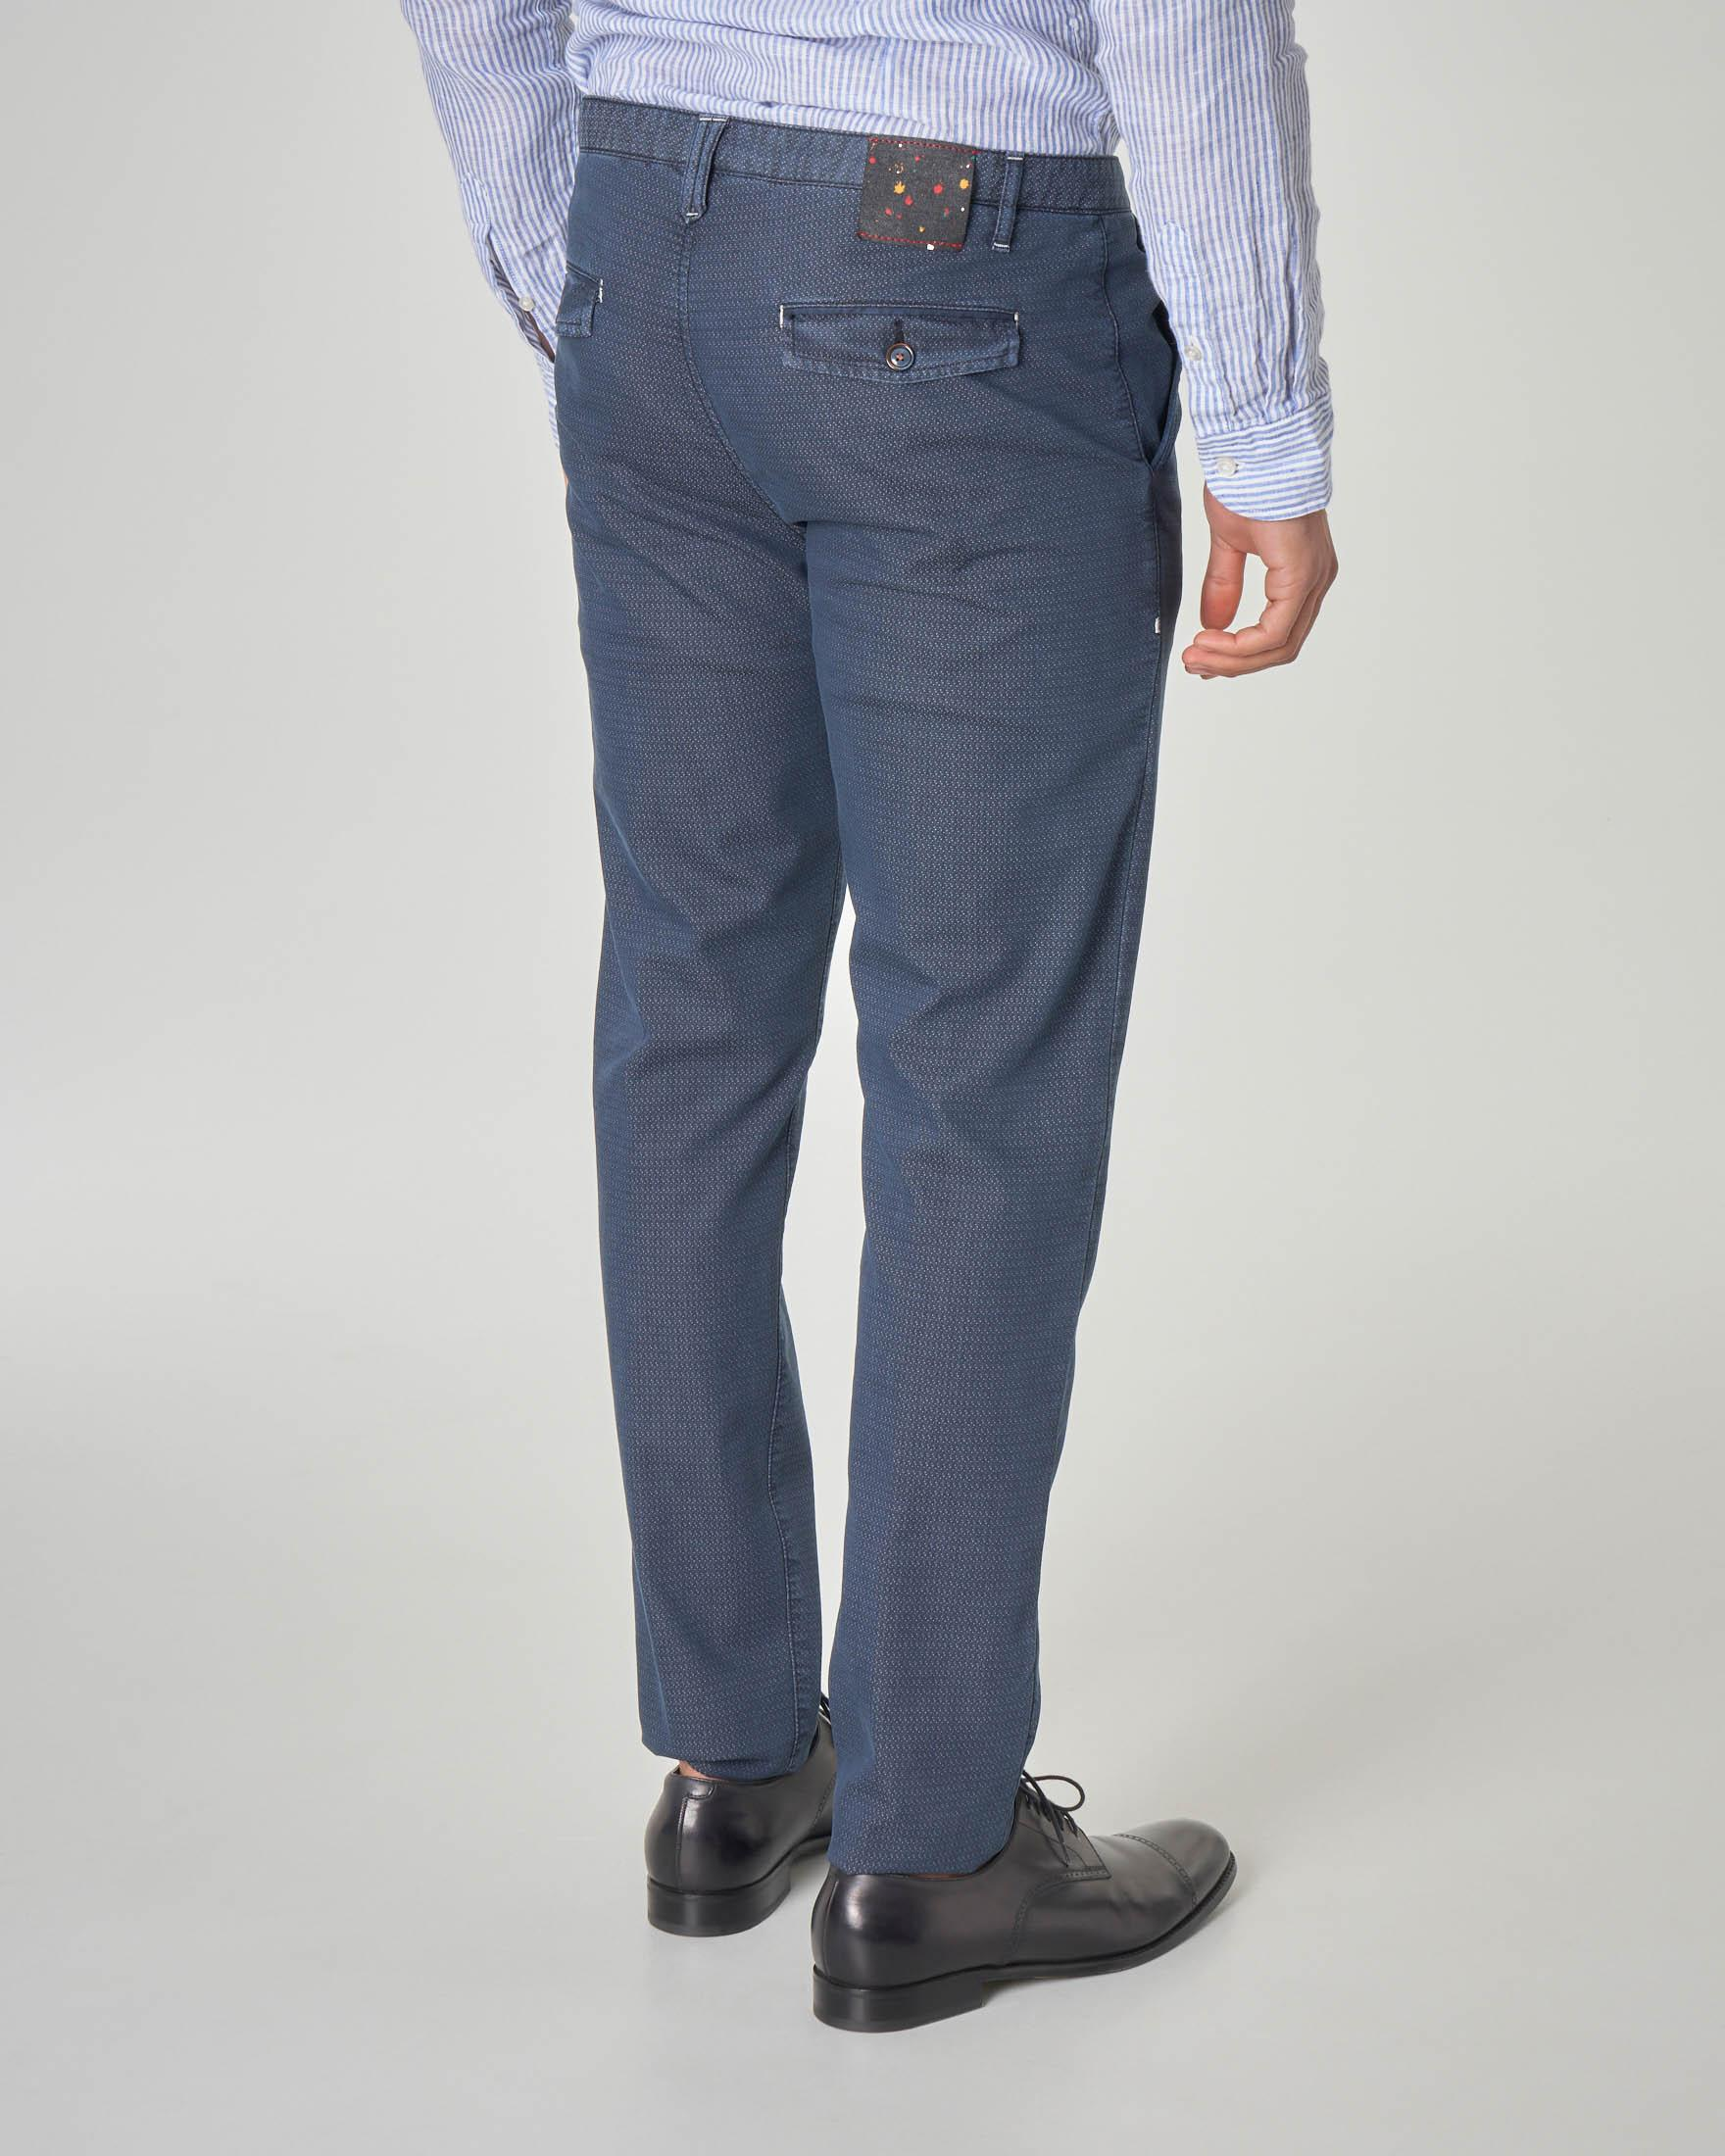 Pantalone chino blu micro-fantasia